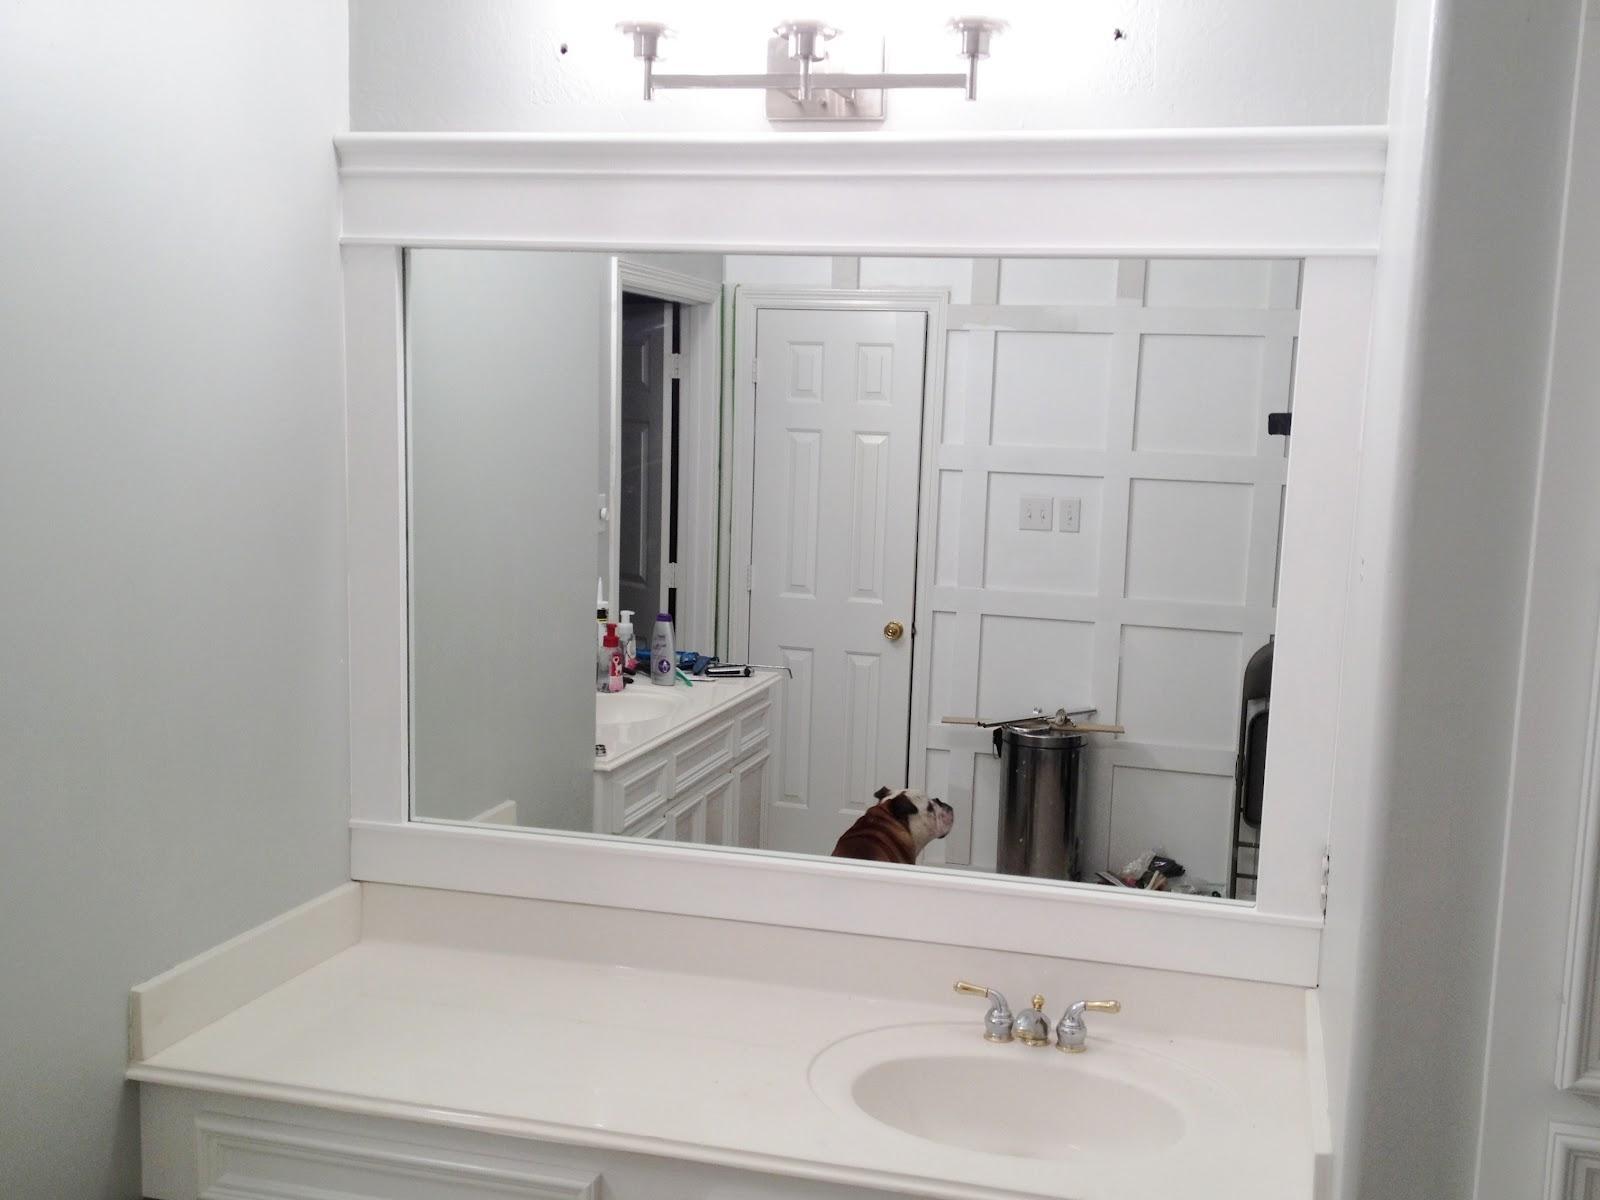 Oak Framed Bathroom Mirrors 118 Stunning Decor With Small Vanity Inside Oak Framed Wall Mirror (View 19 of 20)